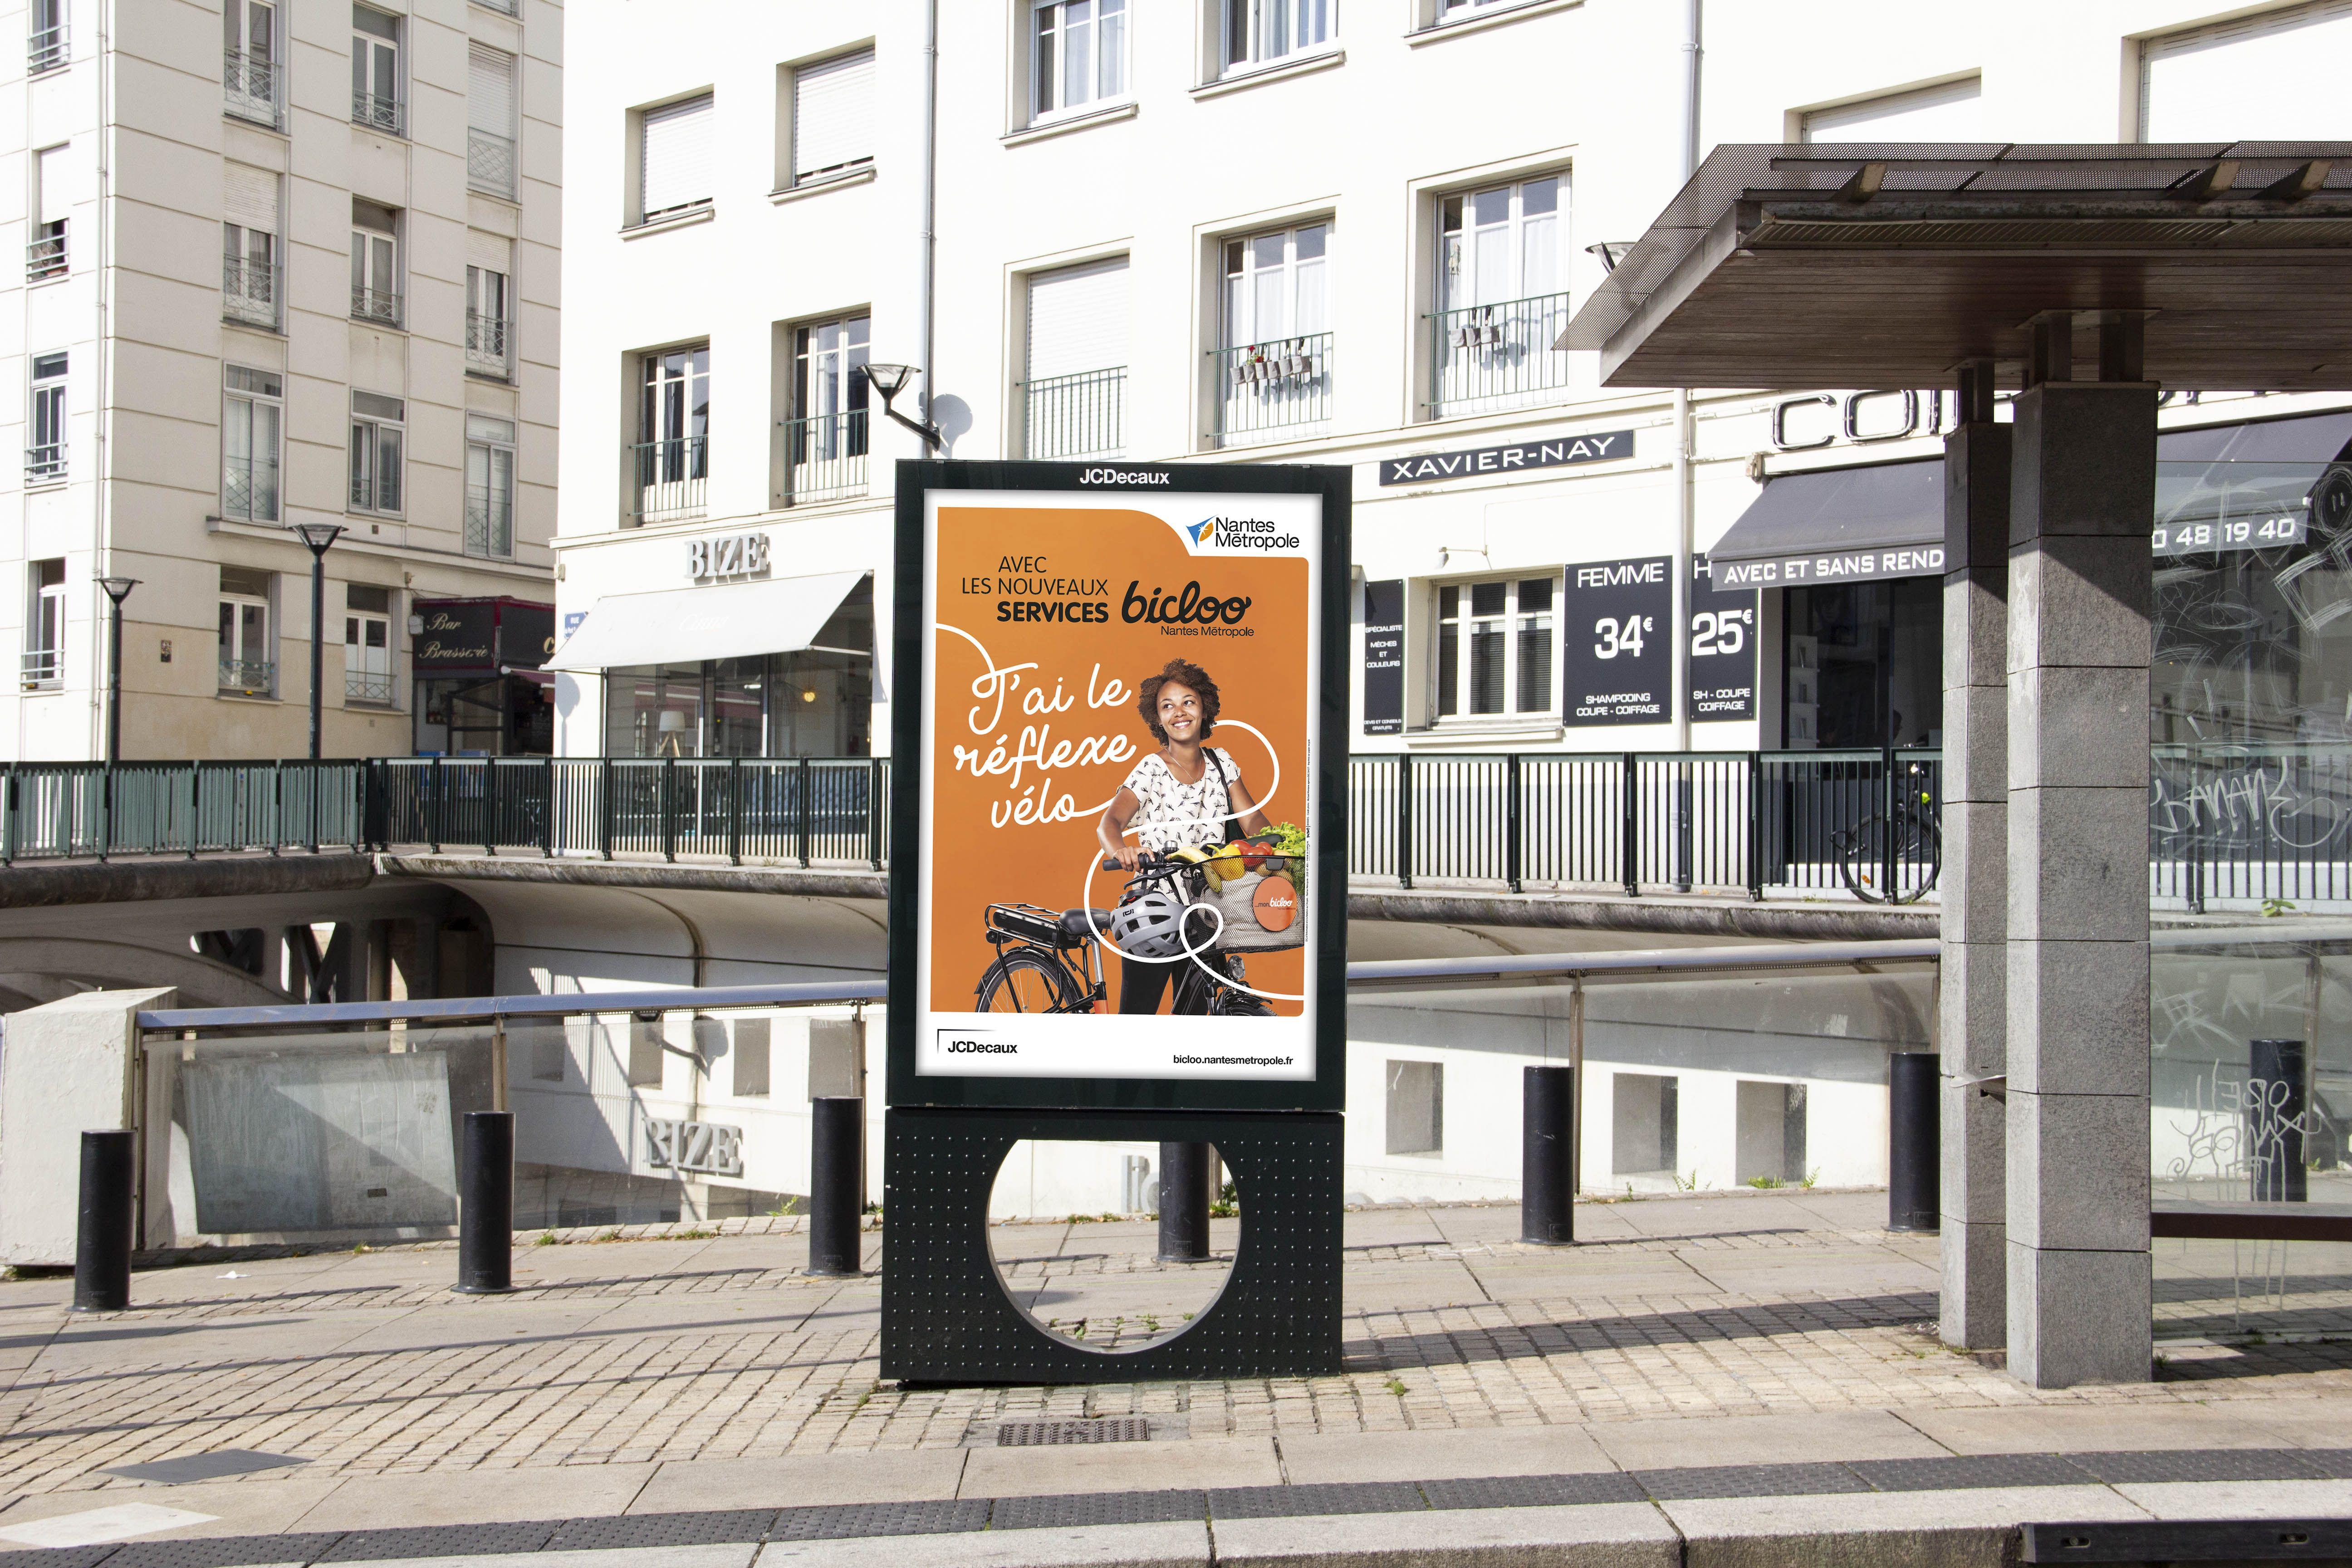 Les Services Bicloo Nantes Metropole Metropole Campagne De Communication